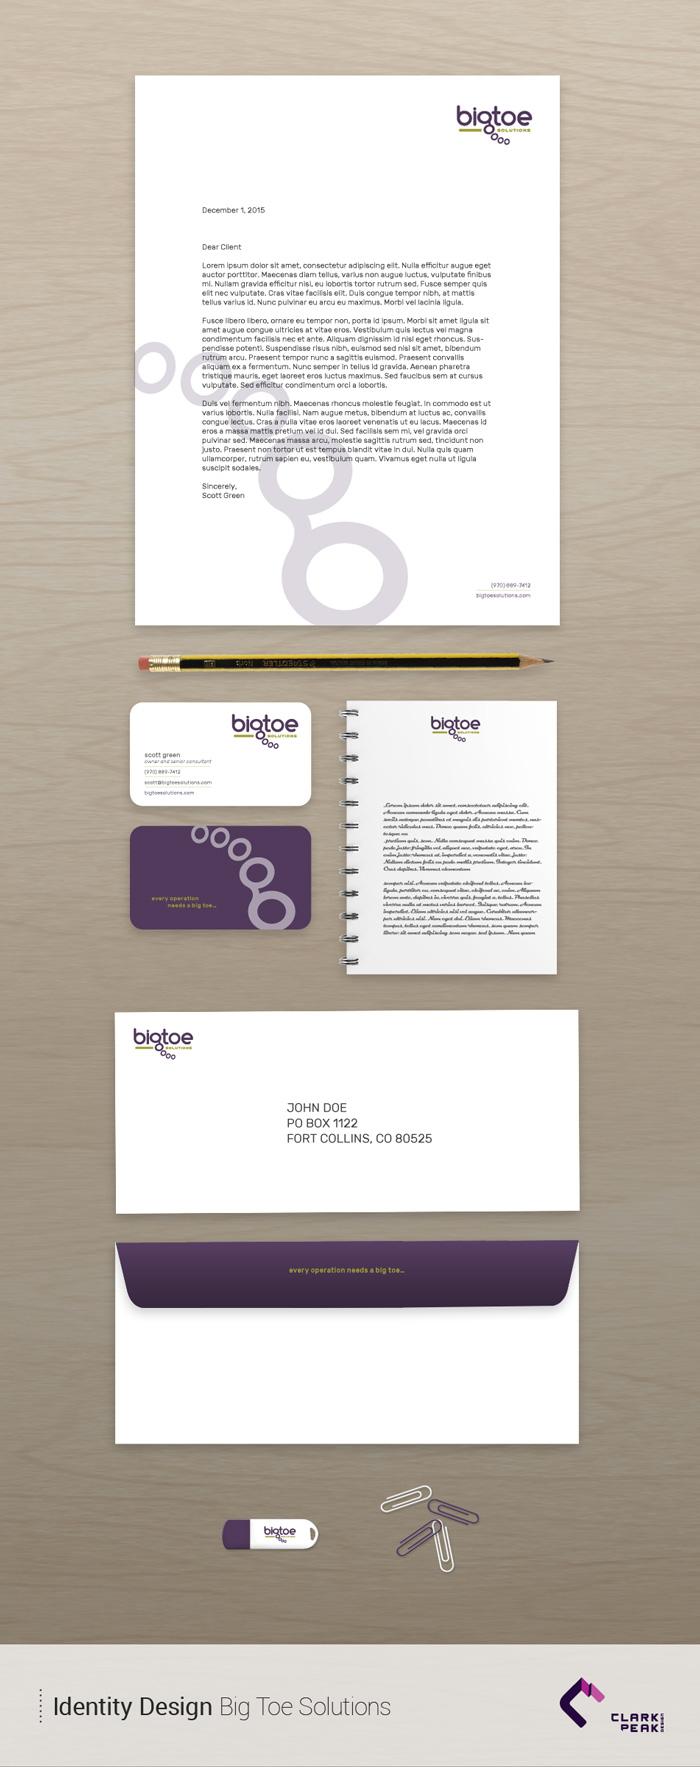 Identity Design for Big Toe Solutions by Clark Peak Design